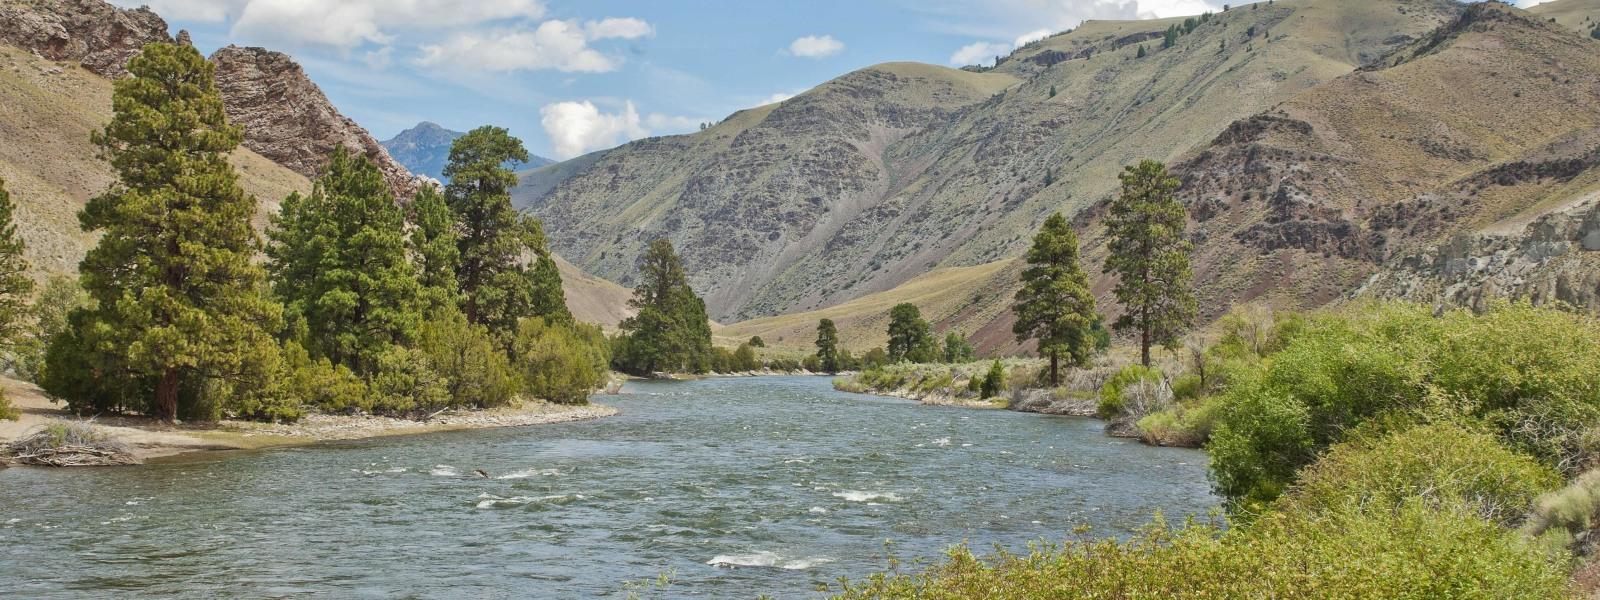 SalmonRiver-Tour-Guide